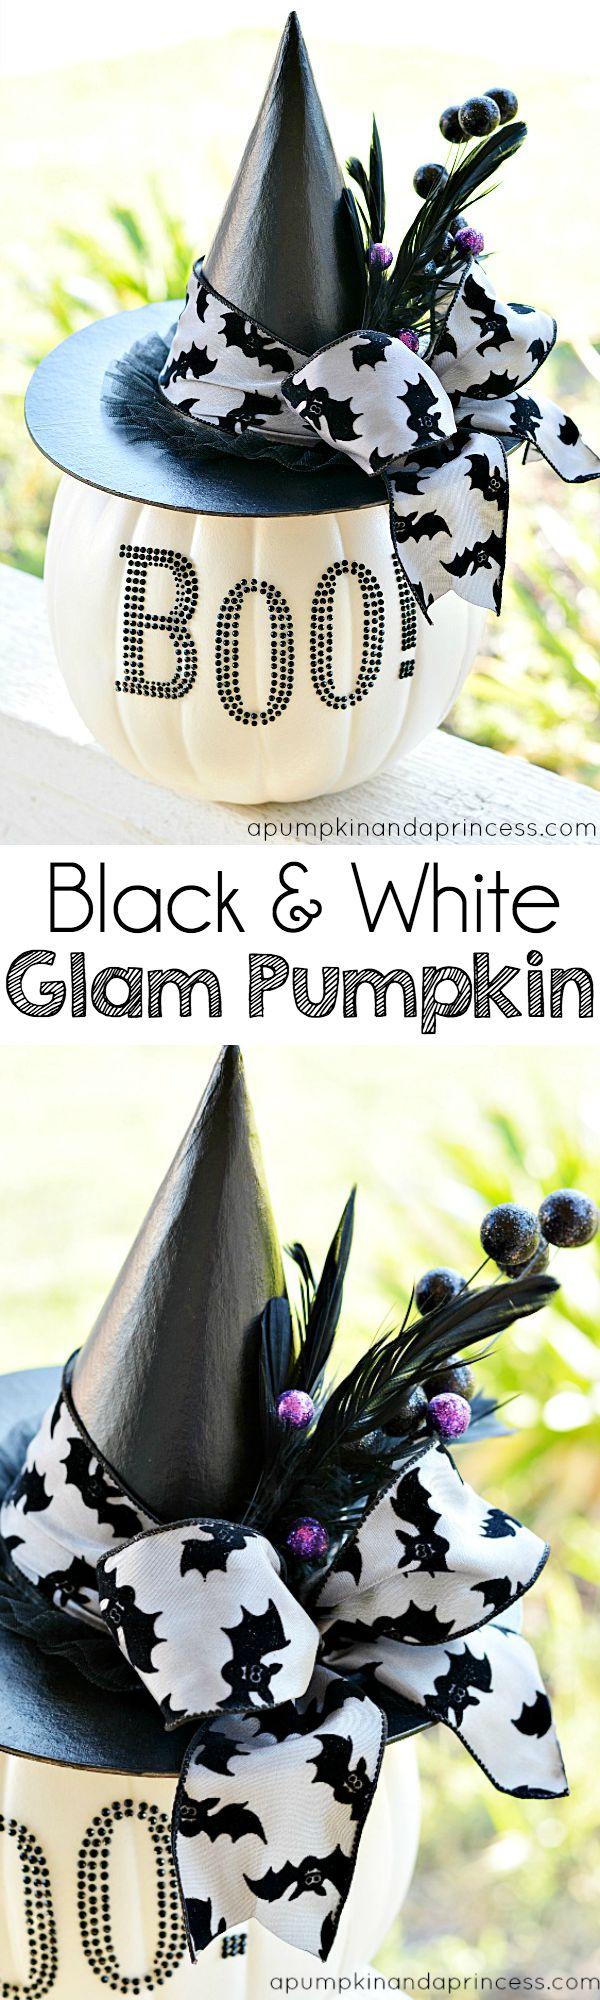 Black-and-White-Glam-Pumpkin DIY